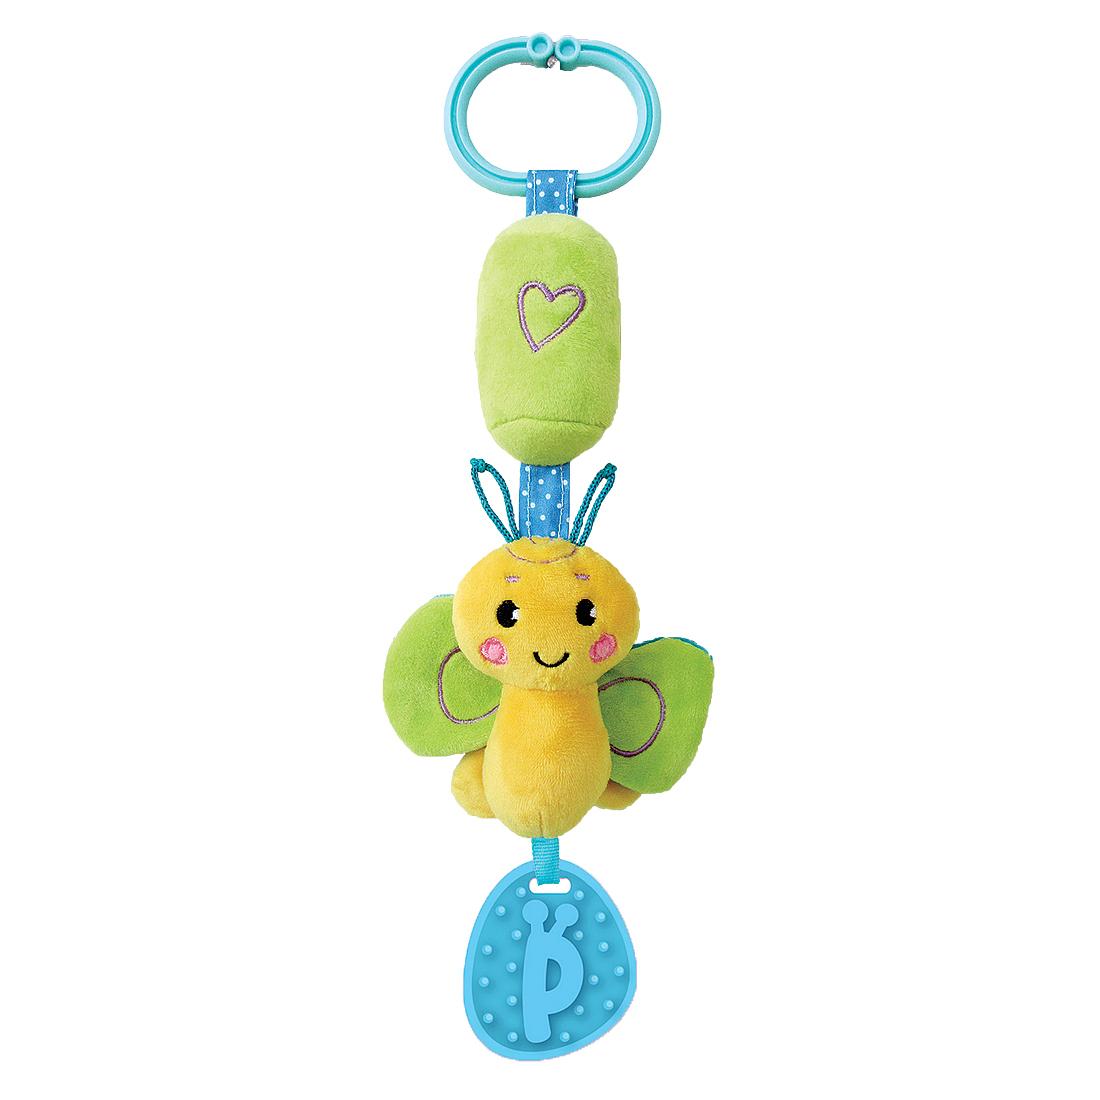 Прорезыватели Жирафики Бабочка развивающая игрушка жирафики подвеска с колокольчиком и прорезывателем собачка билли 939329